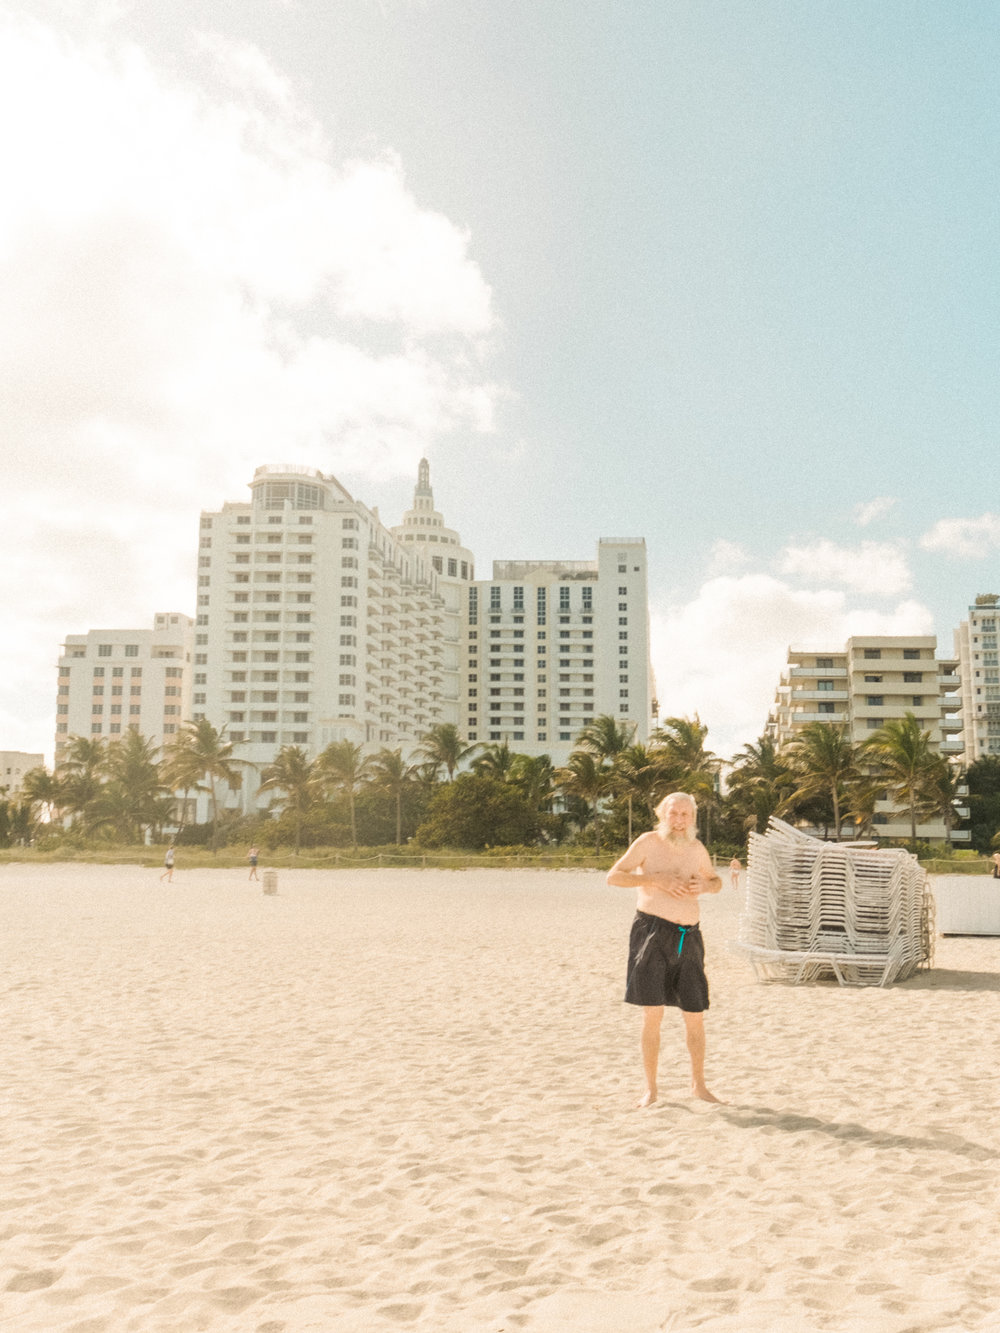 Miami_Beach_Street_84.jpg